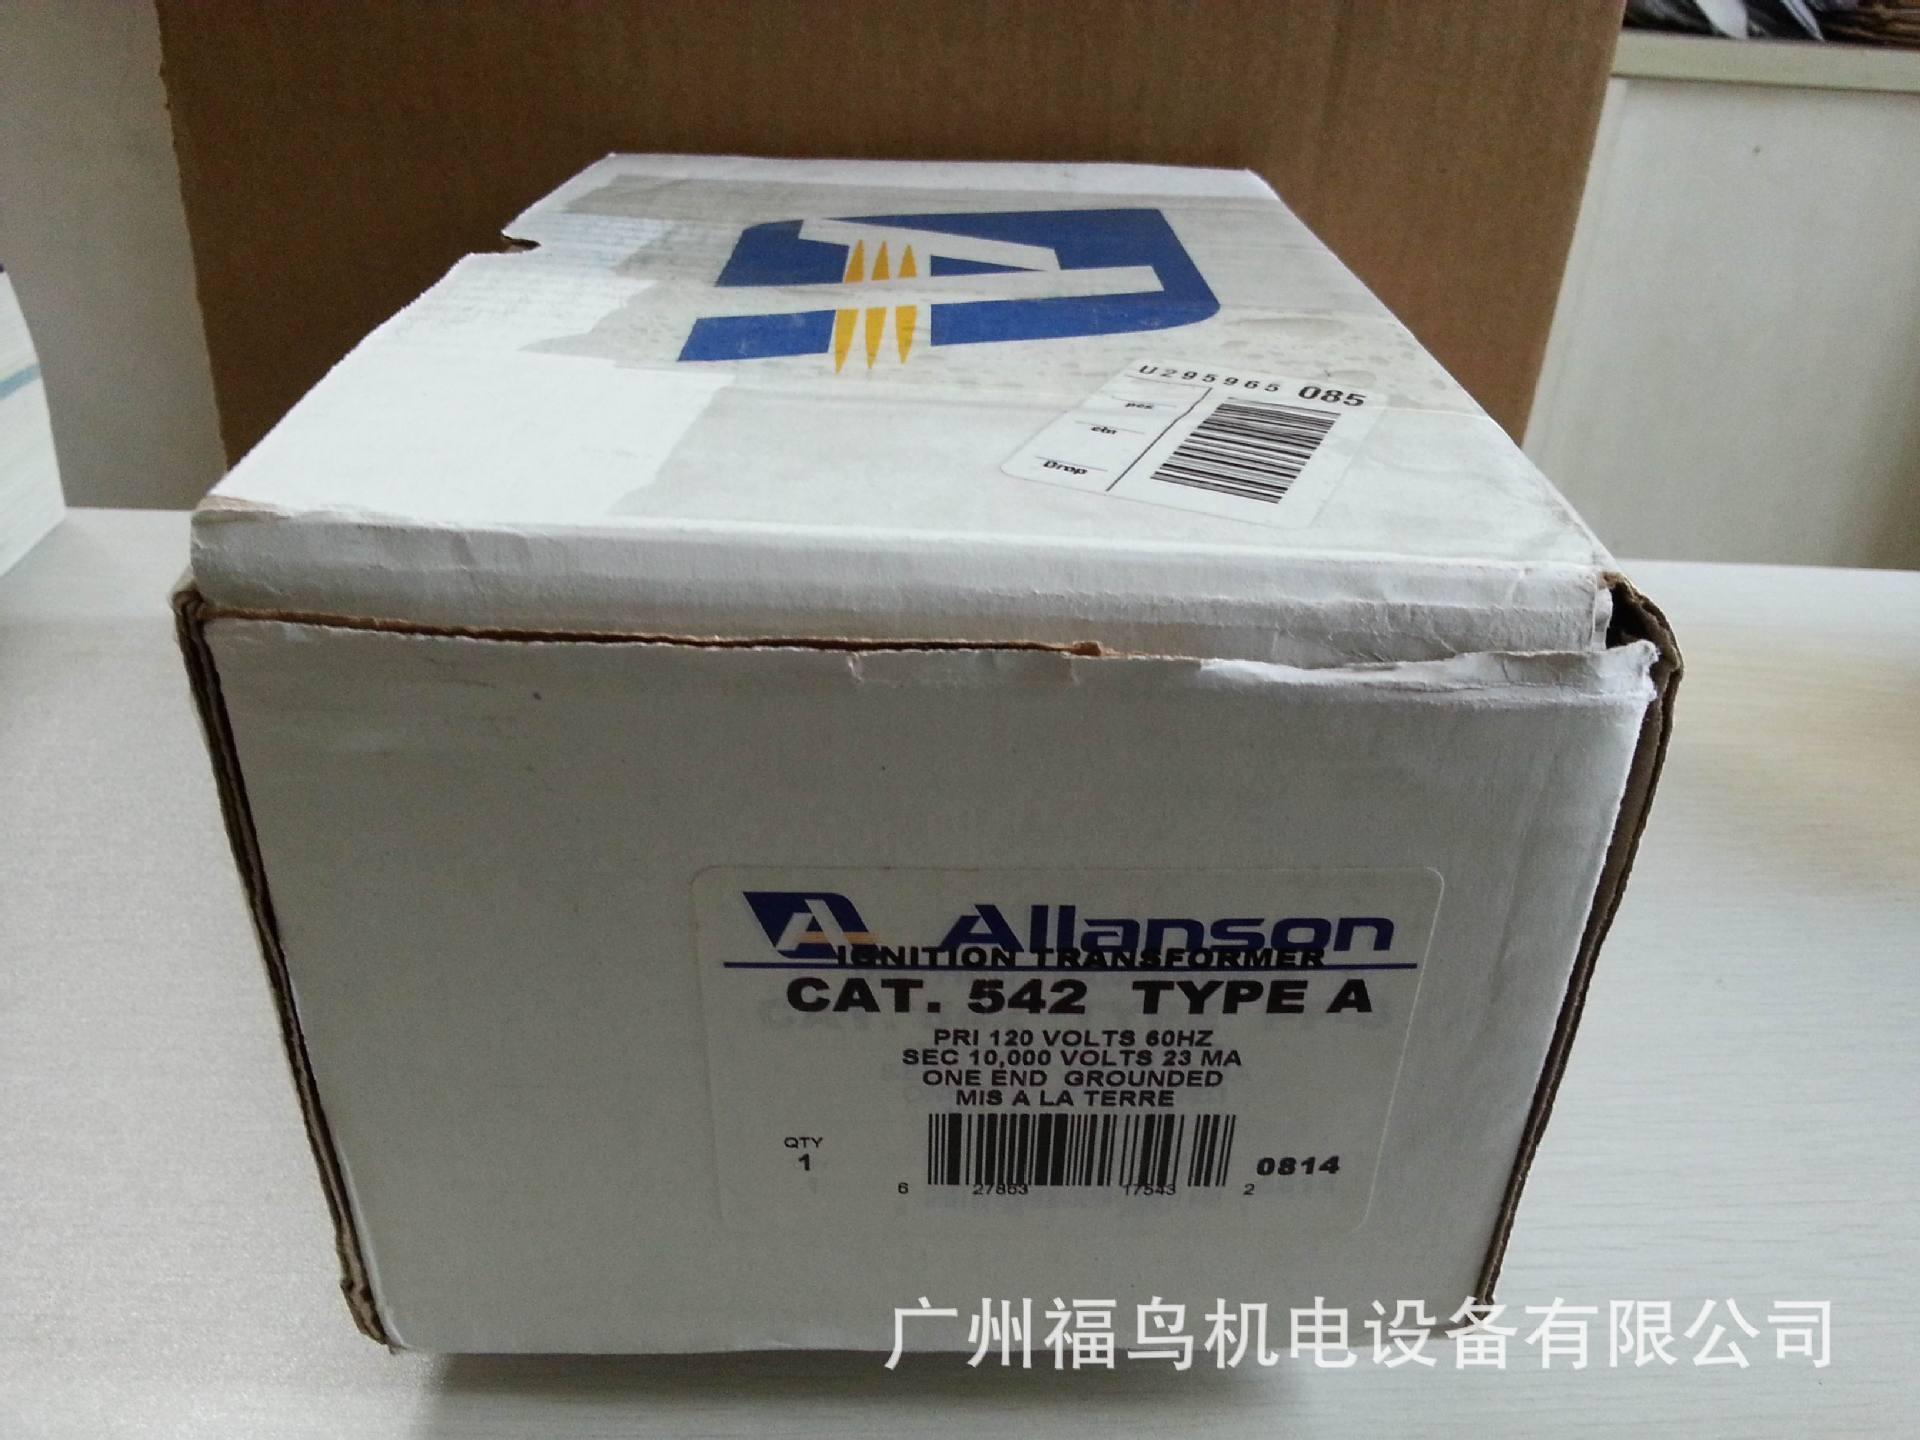 ALLANSON點火變壓器, 型號: 542-A